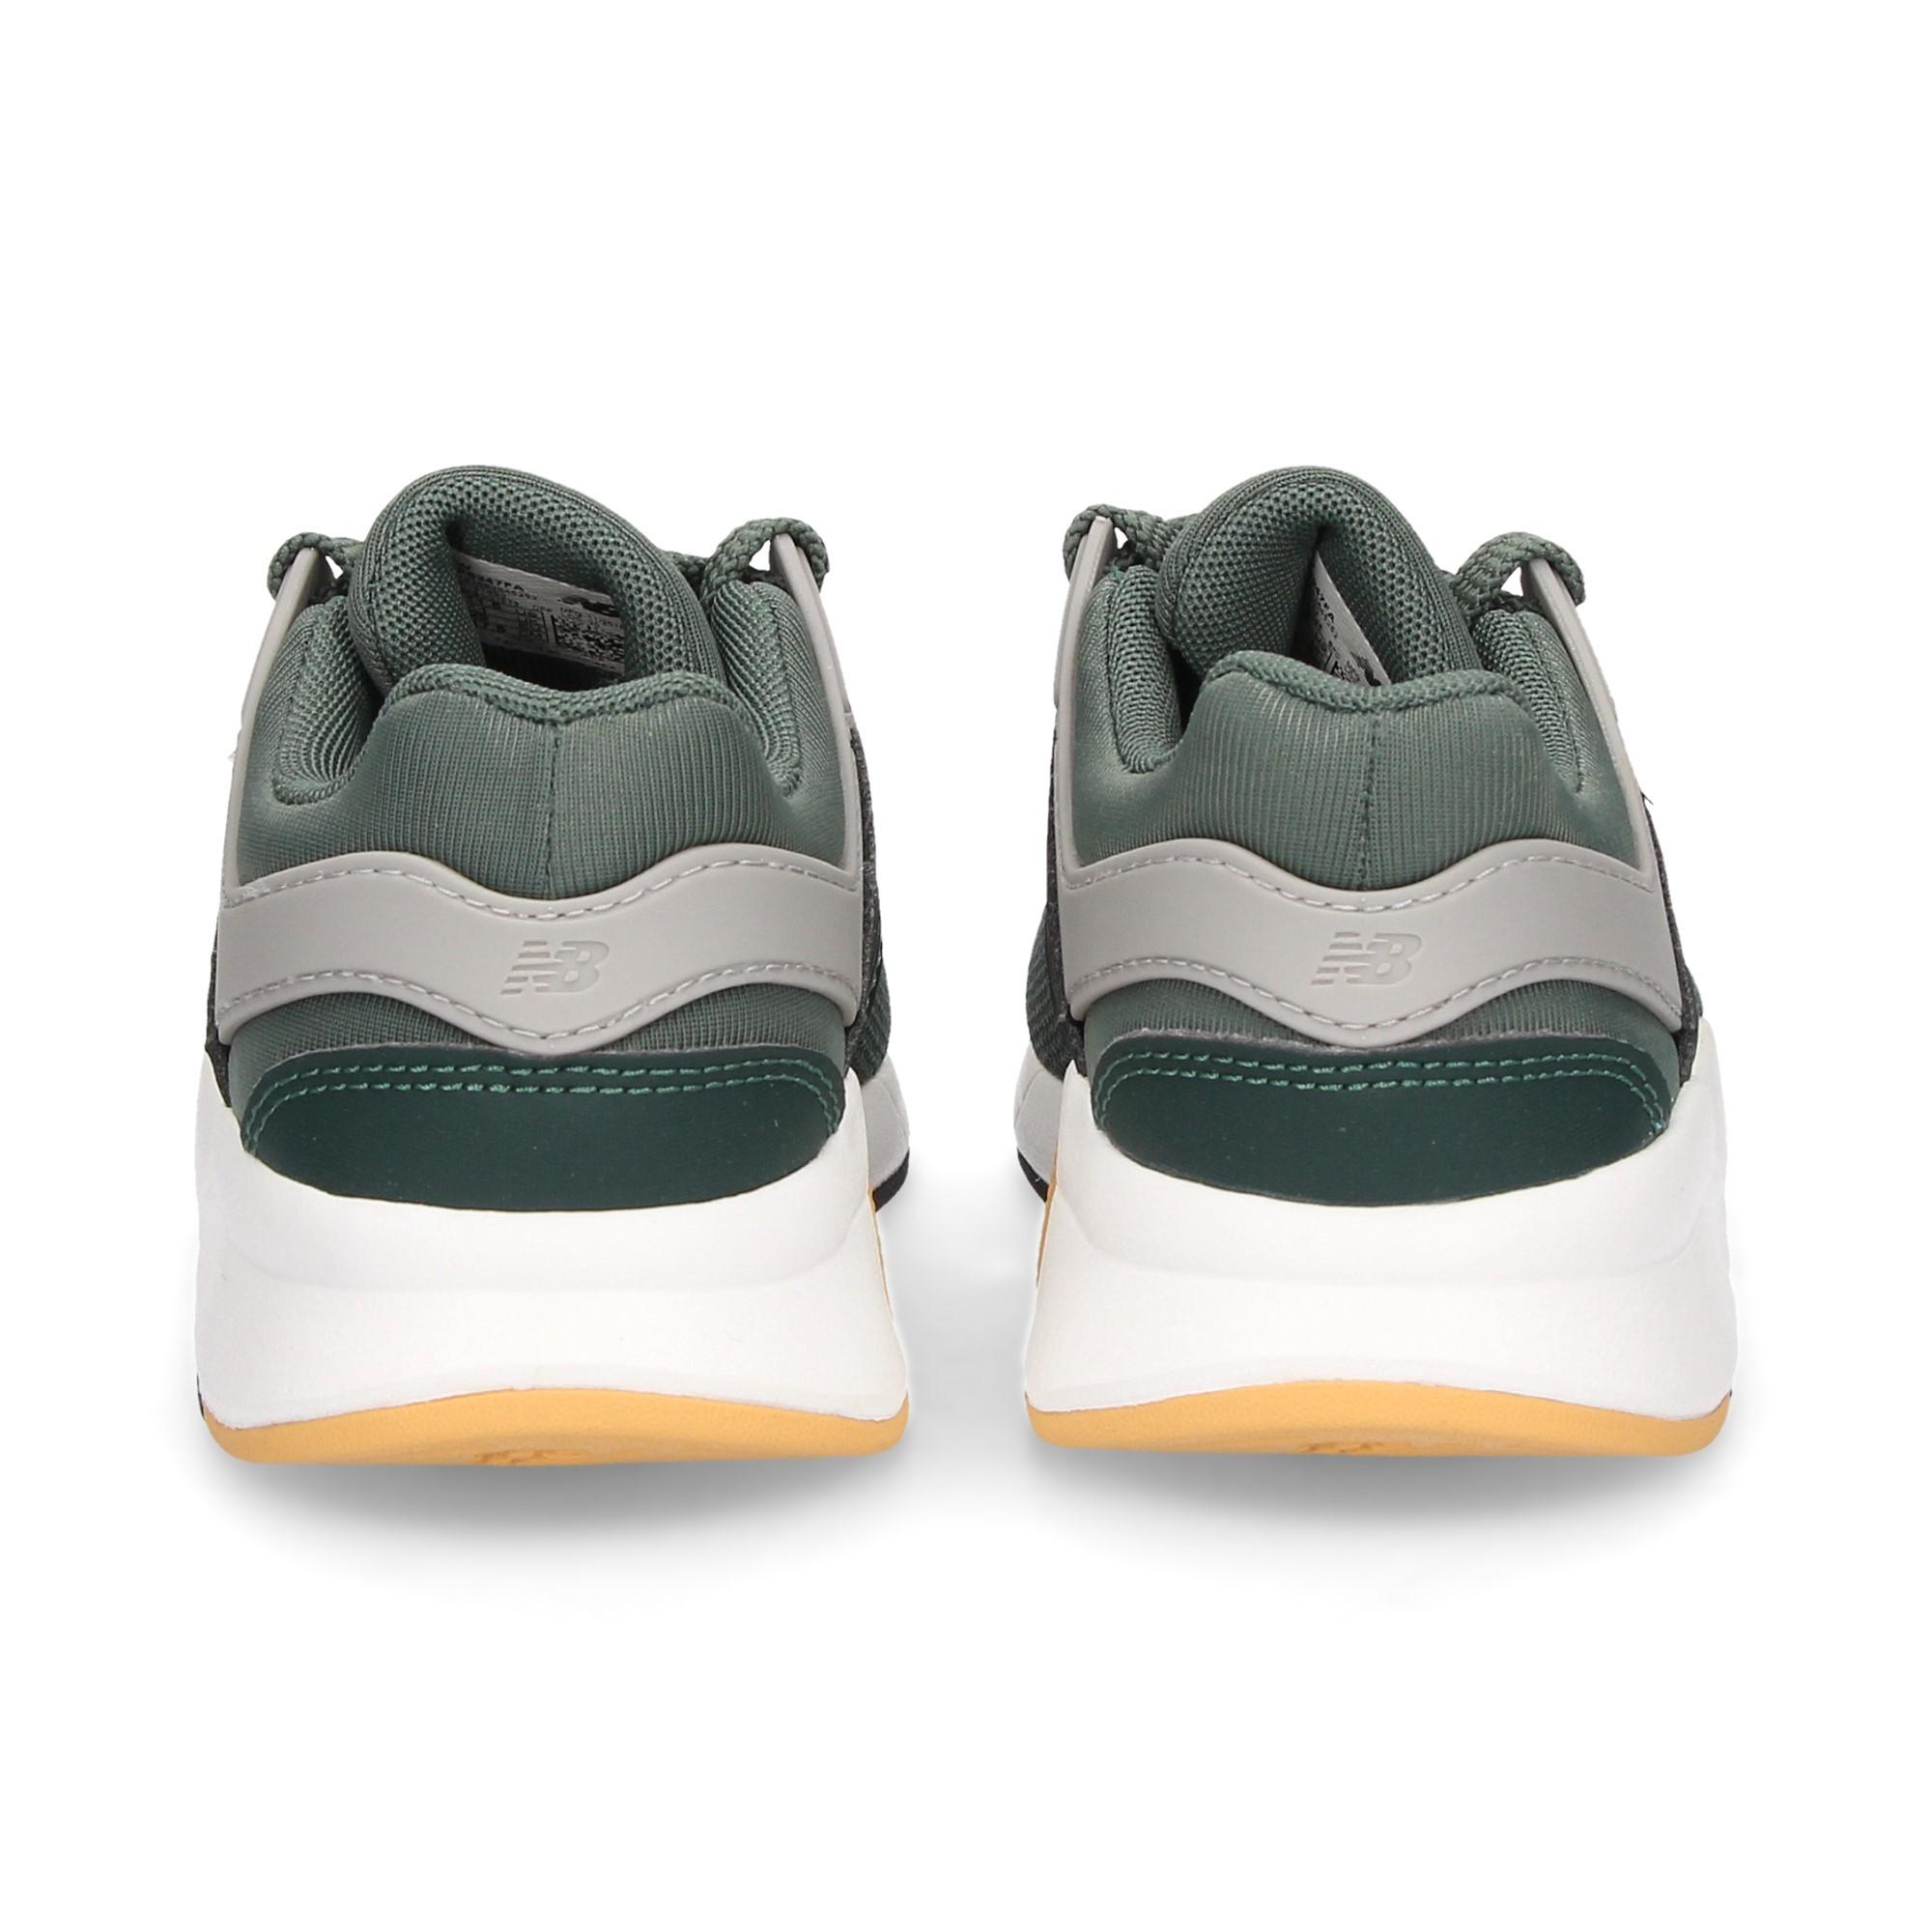 sports-mesh-green-grey